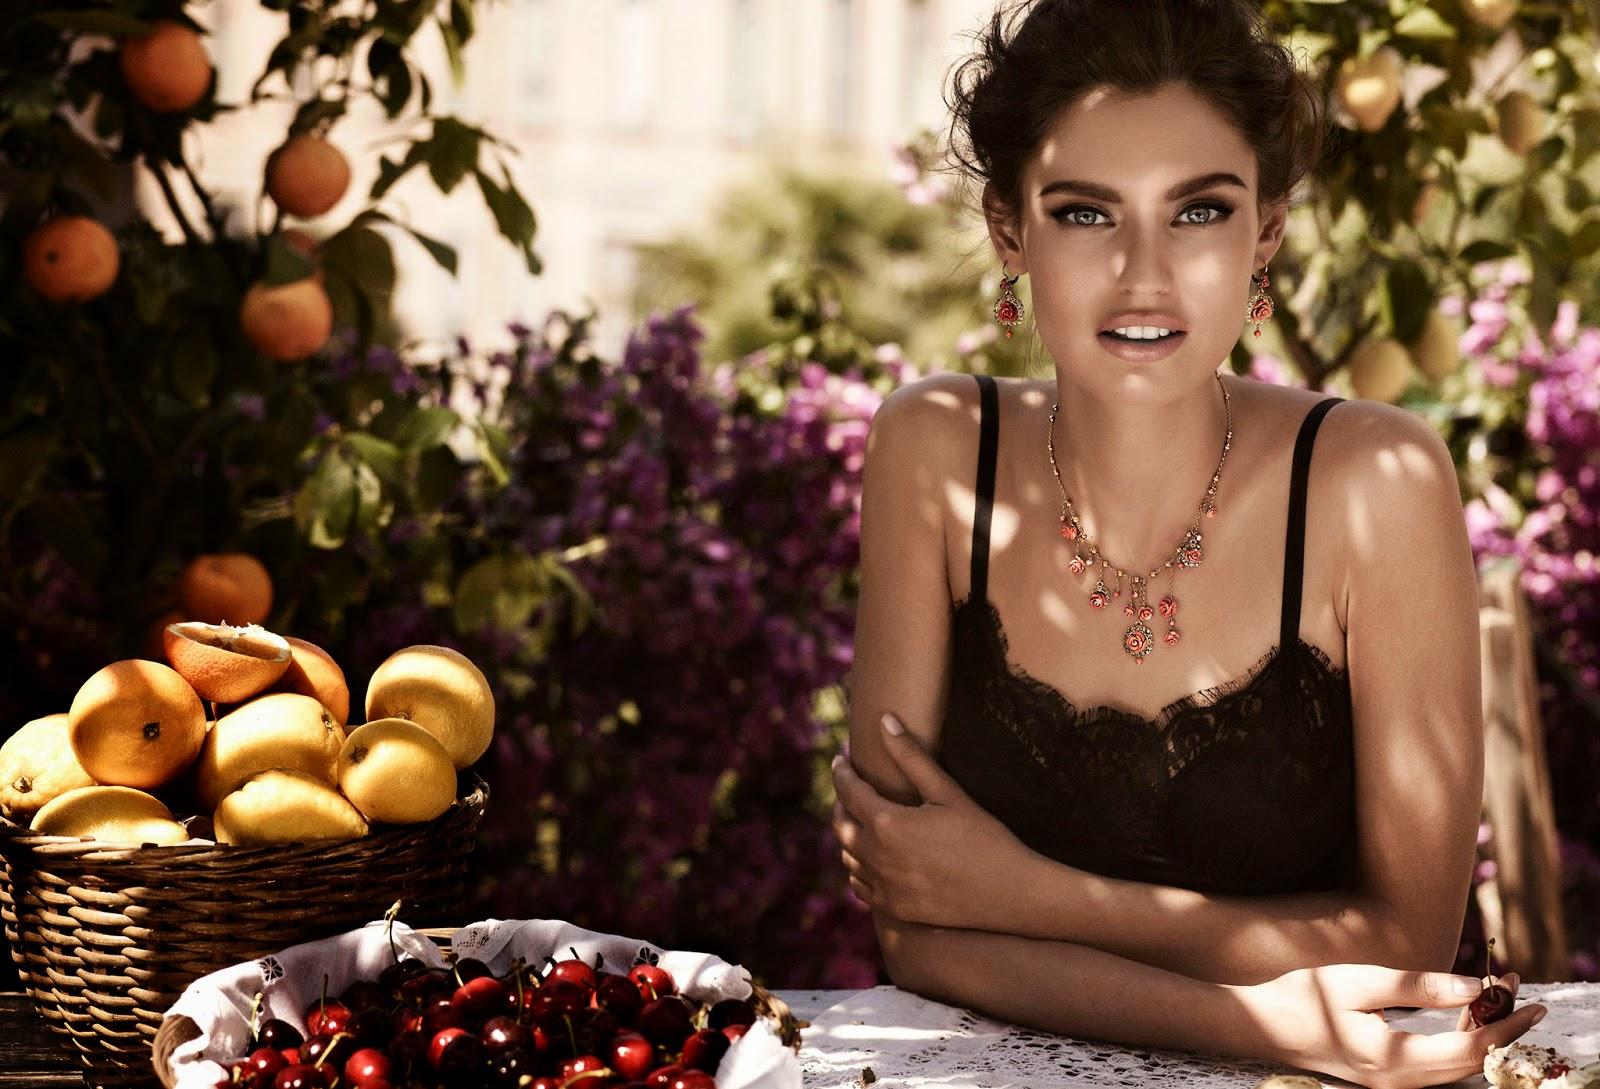 Italian Model Bianca Balti HD Images | HD Wallpapers of Bianca Balti